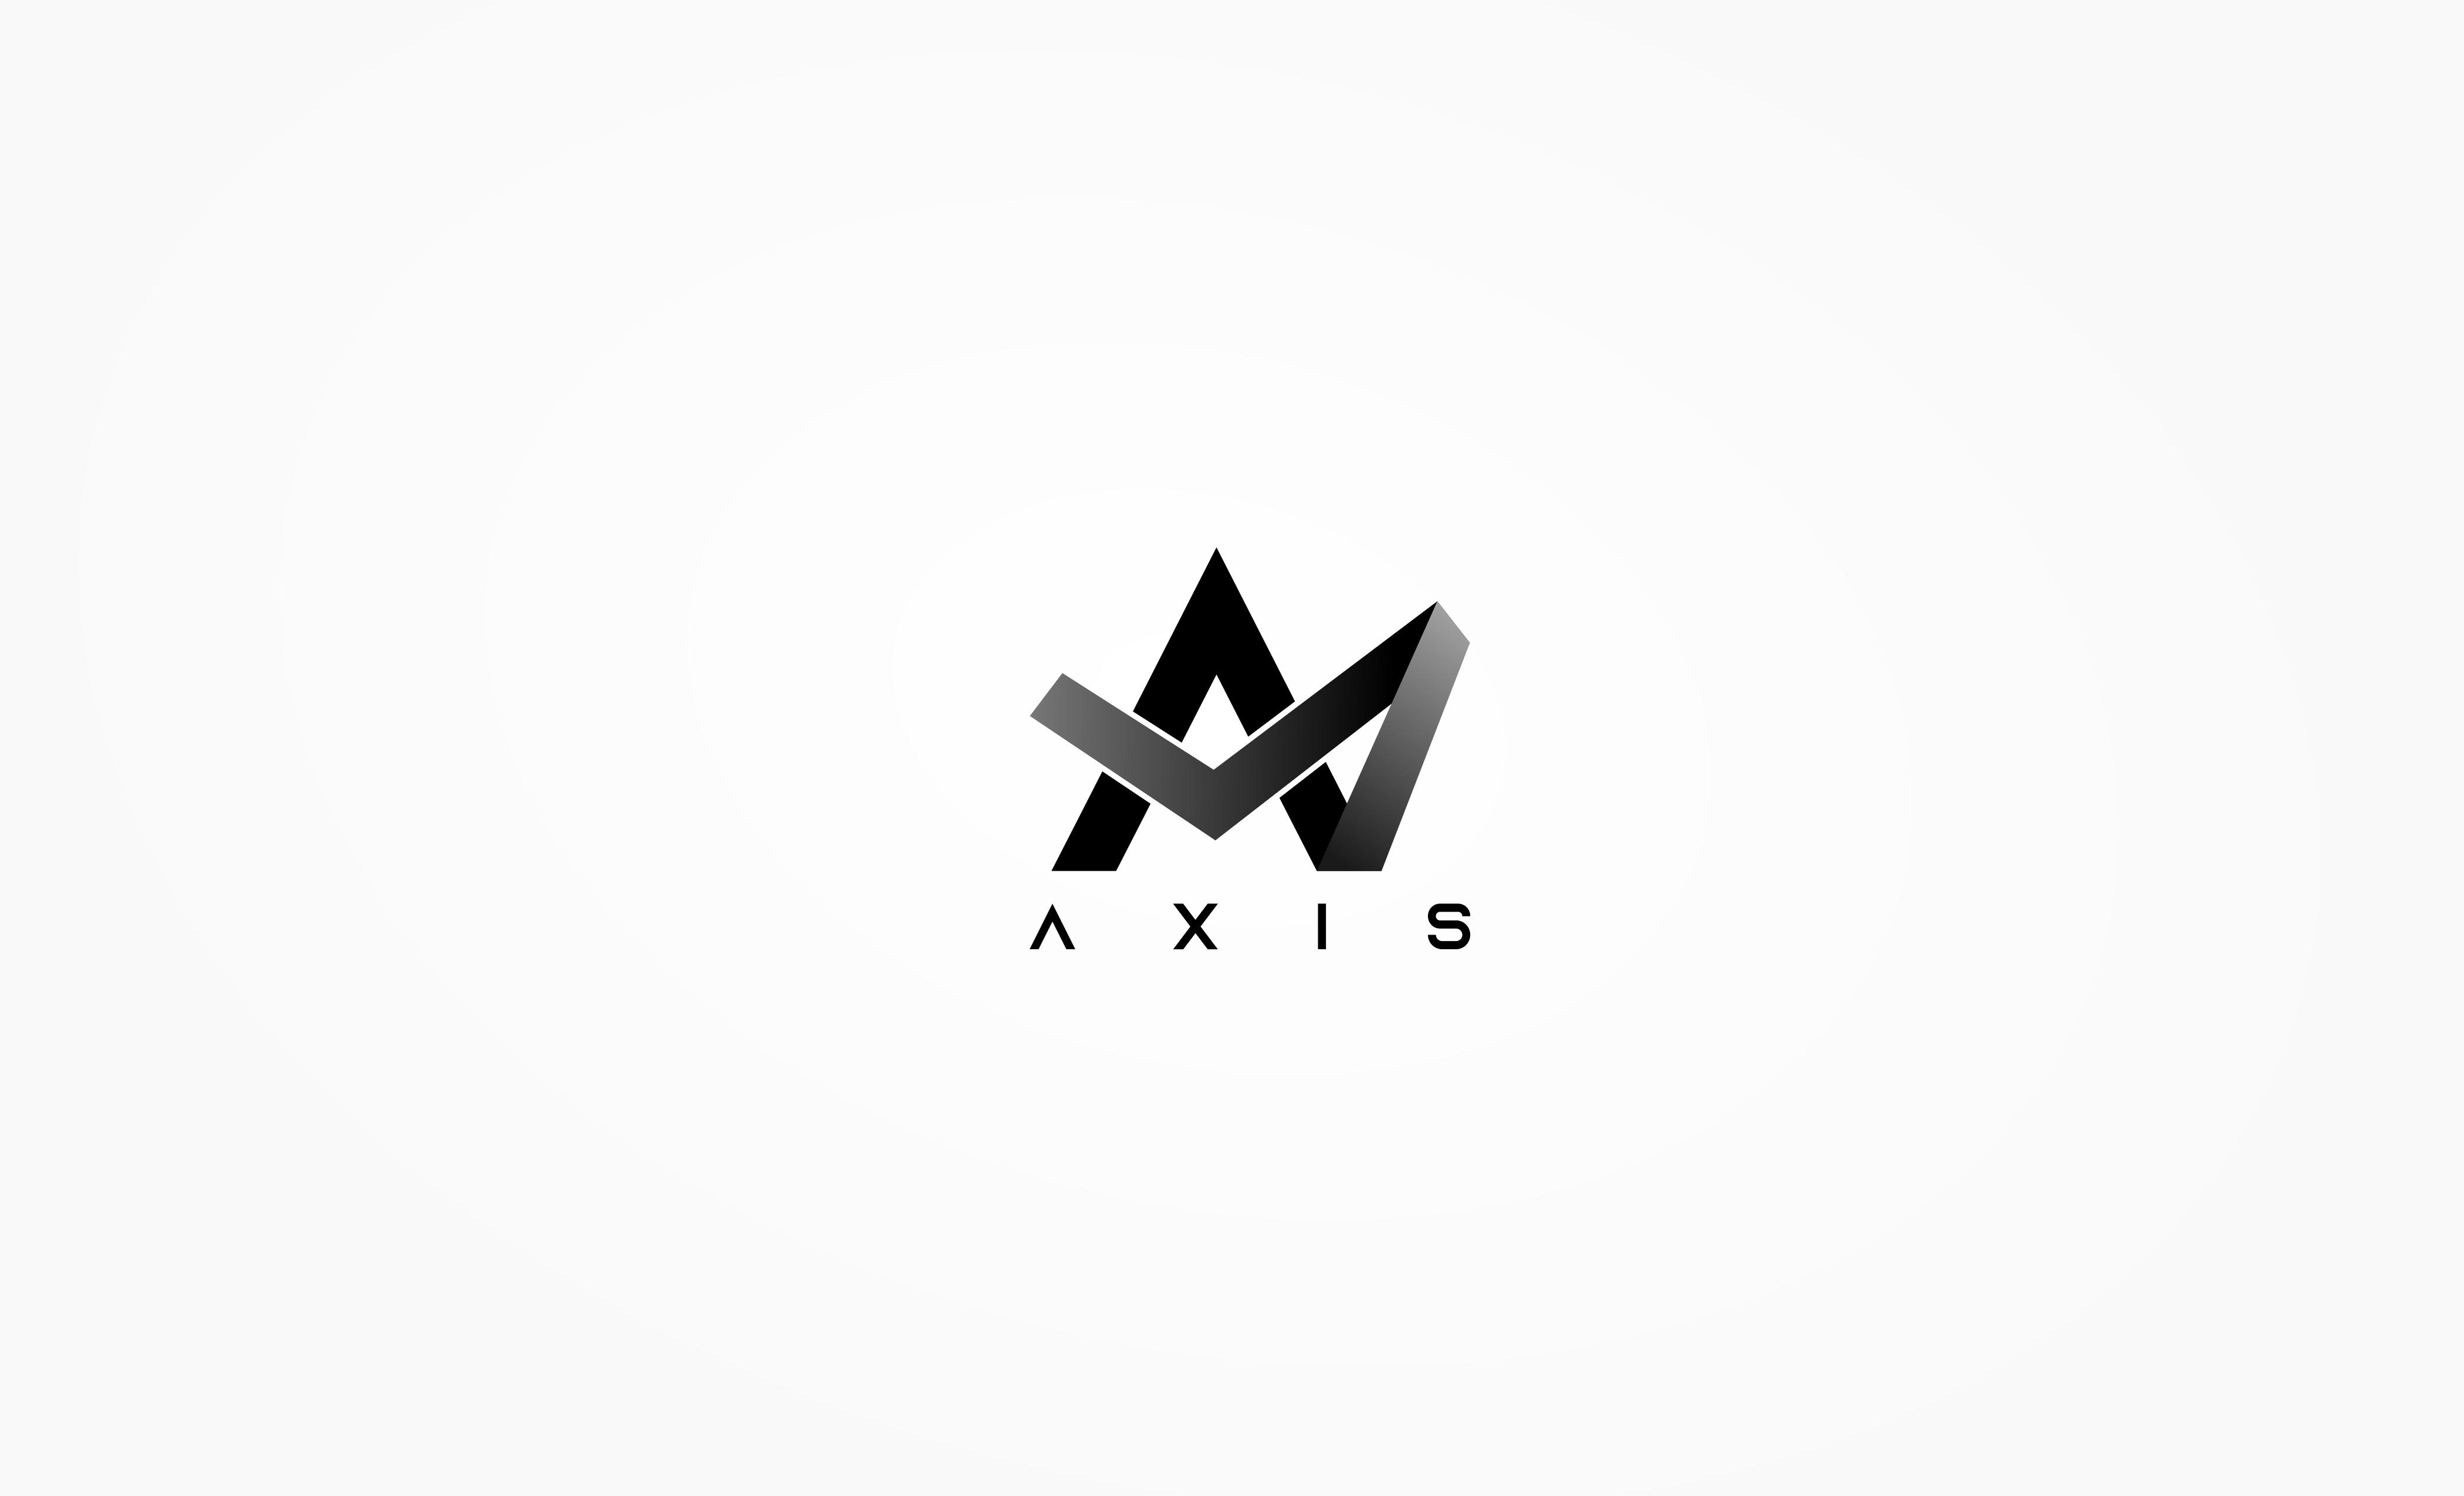 Axis Logo Brand by Ebuka Joseph on Dribbble.